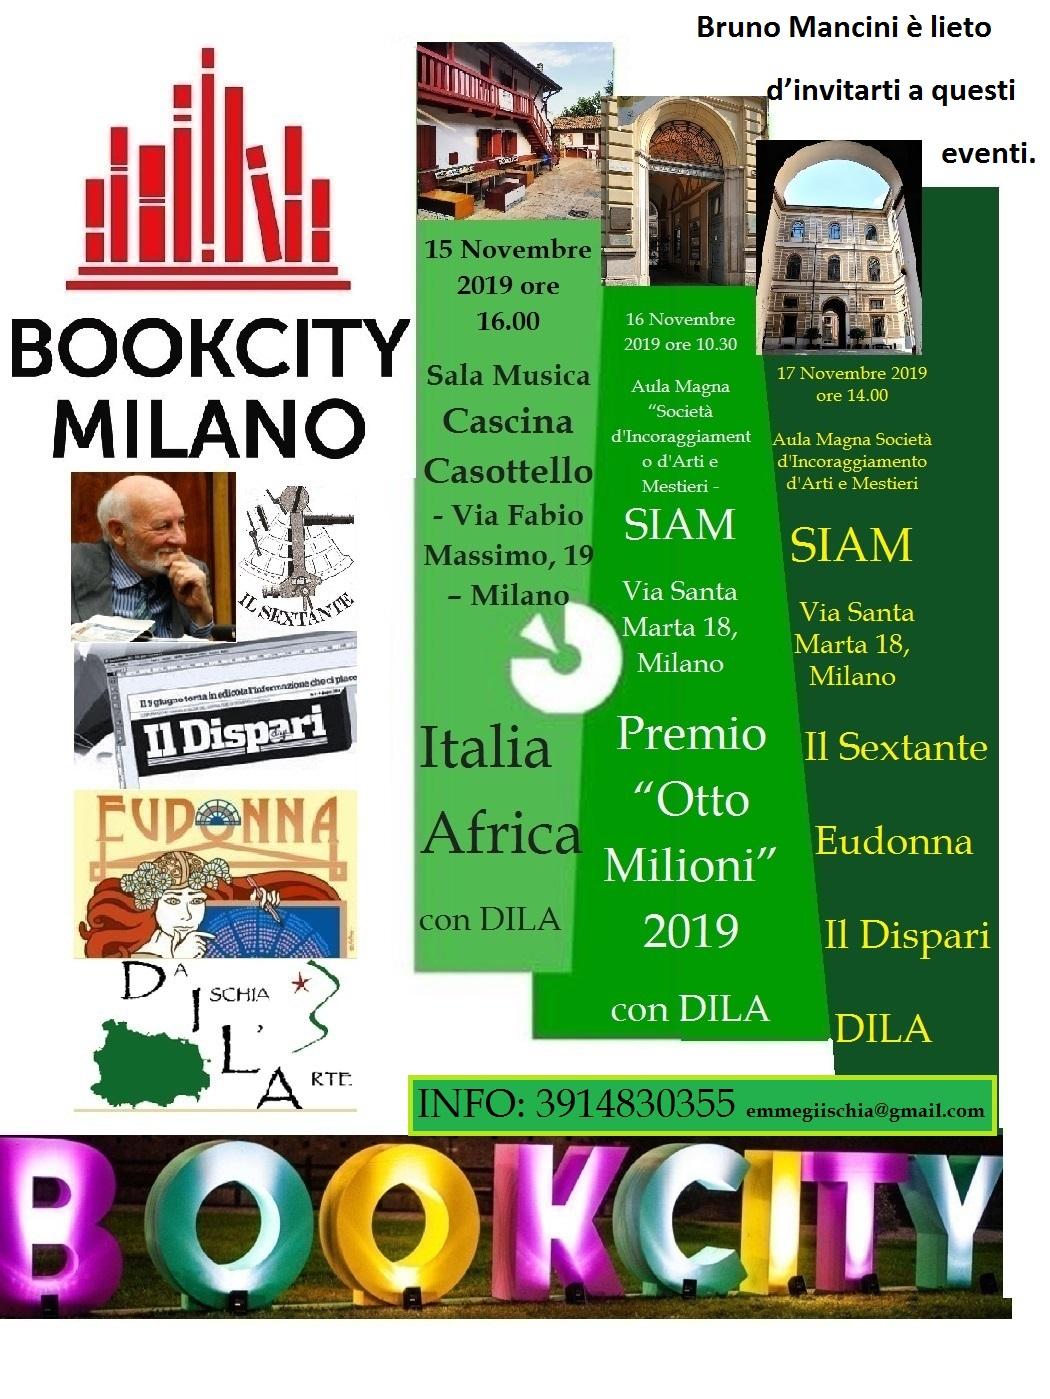 DILA & Bookcity